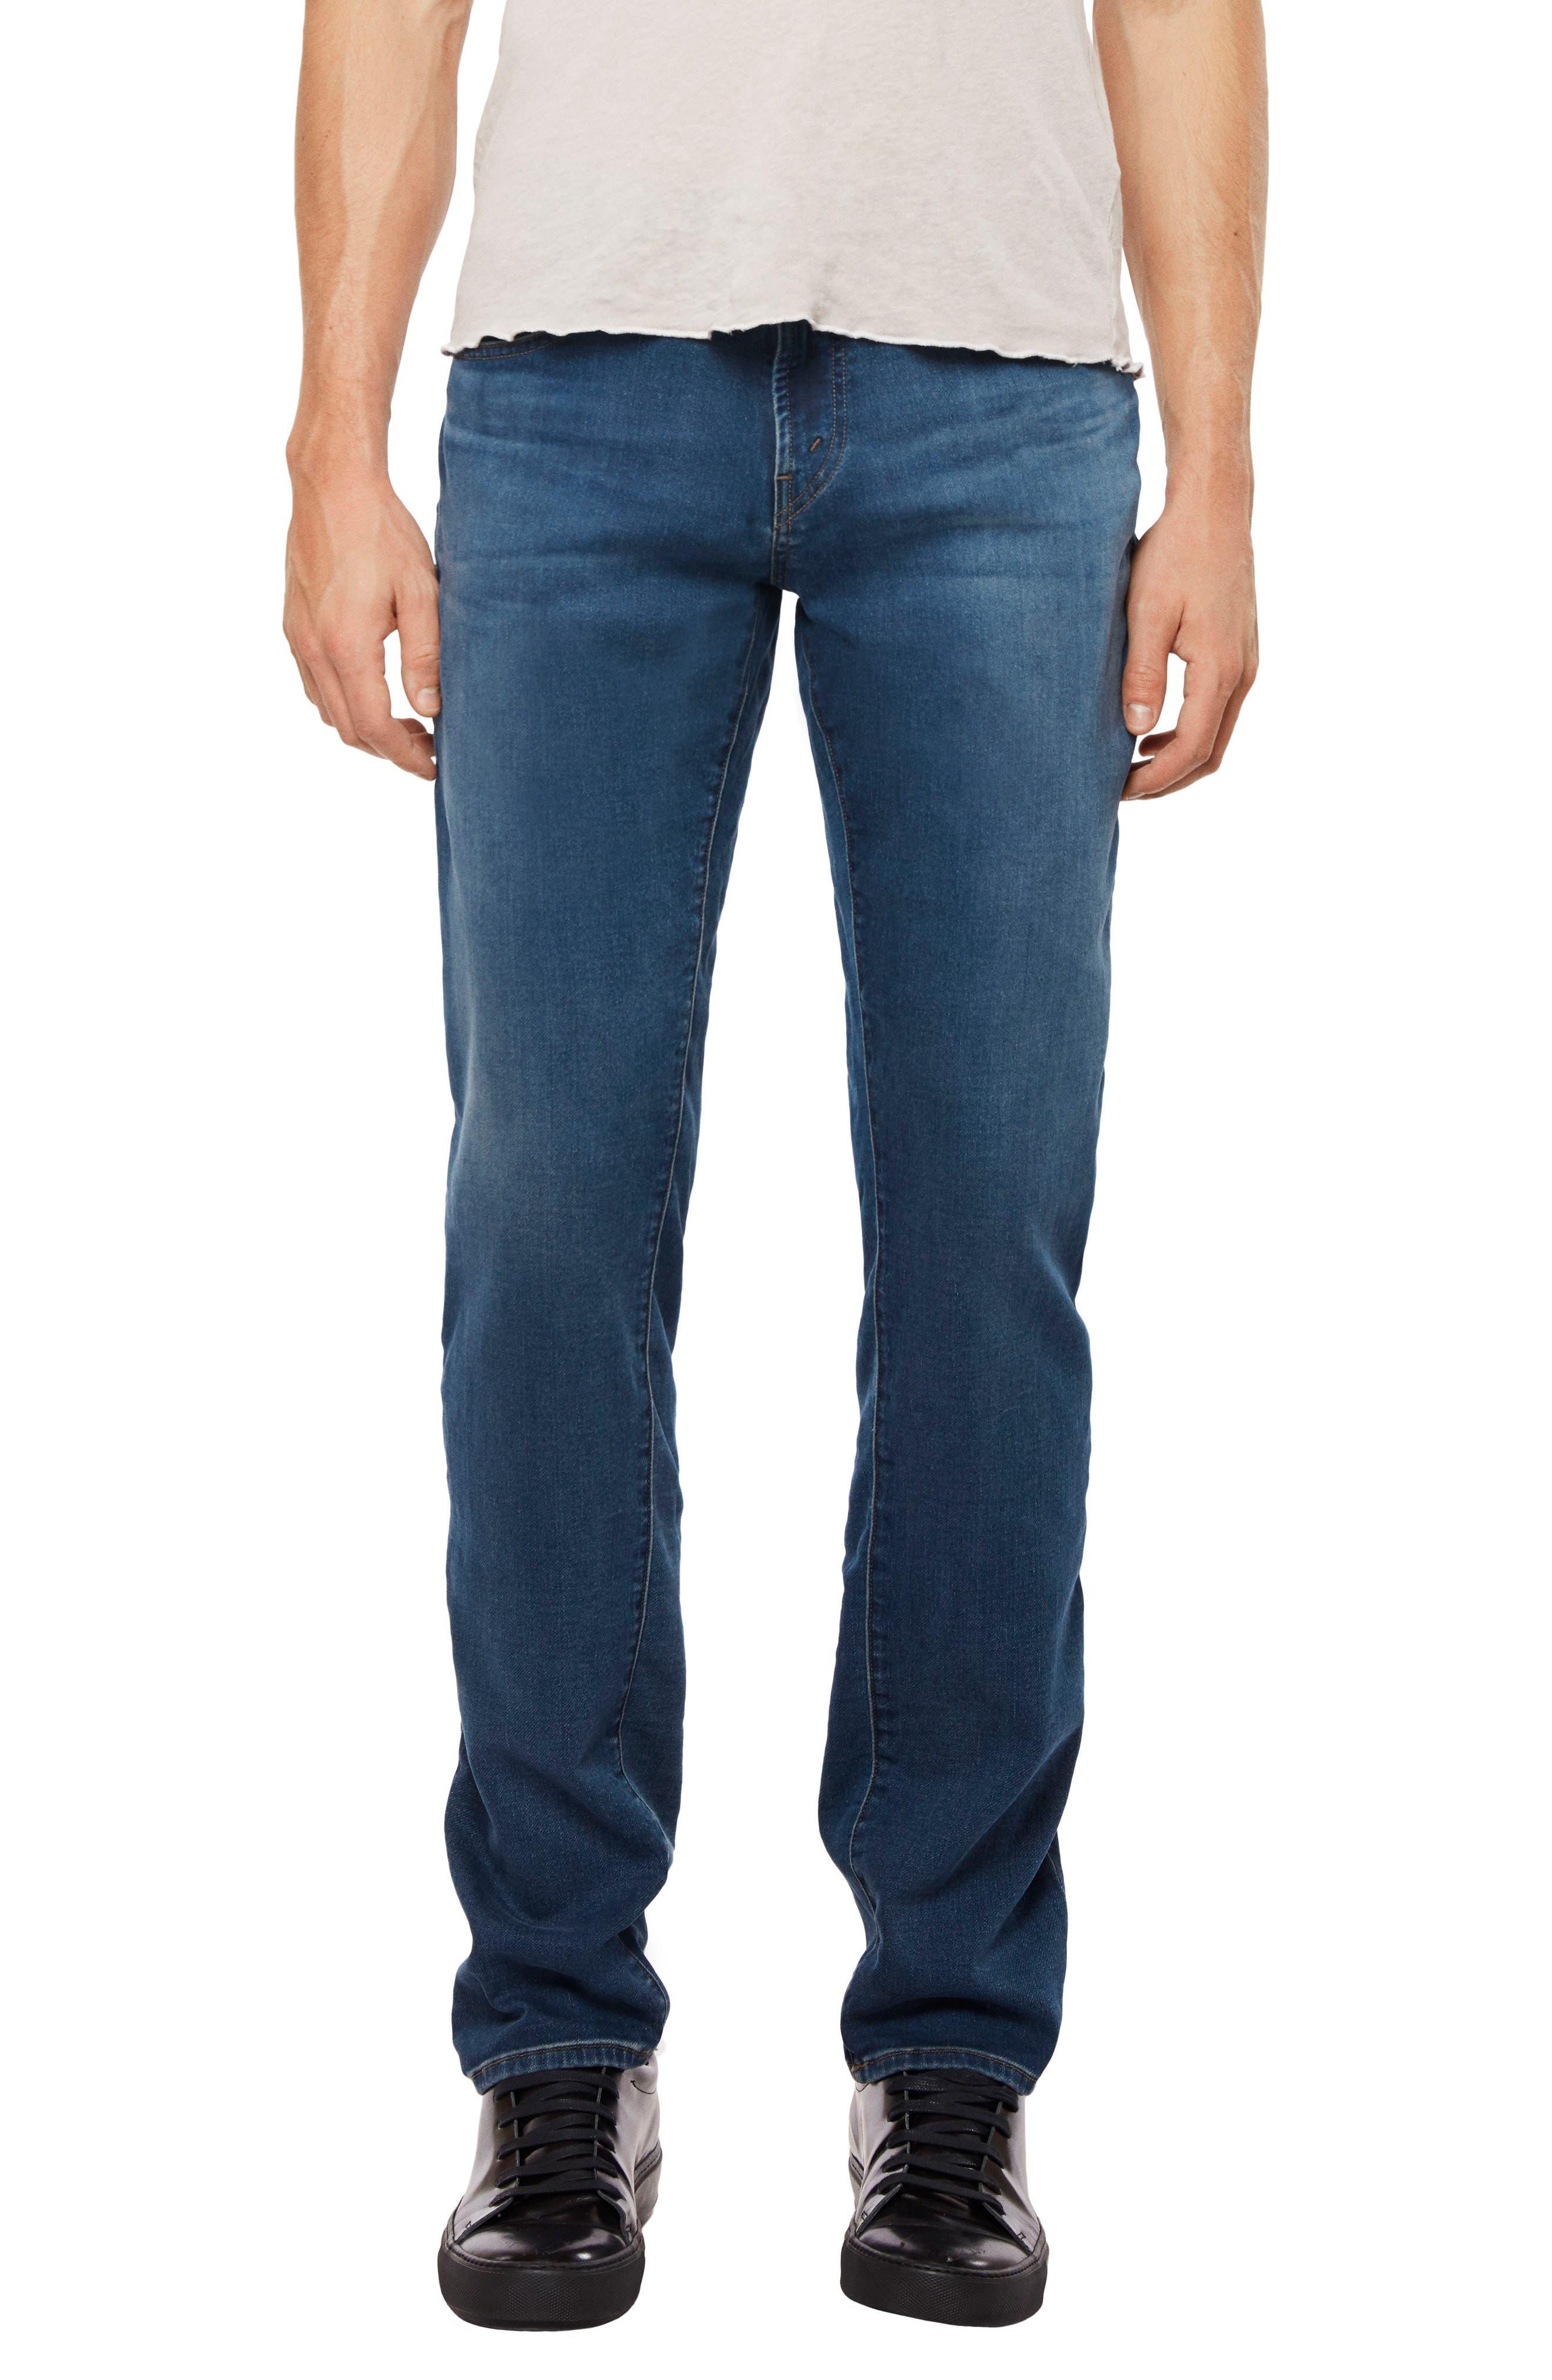 Kane Slim Straight Leg Jeans,                             Main thumbnail 1, color,                             Landform